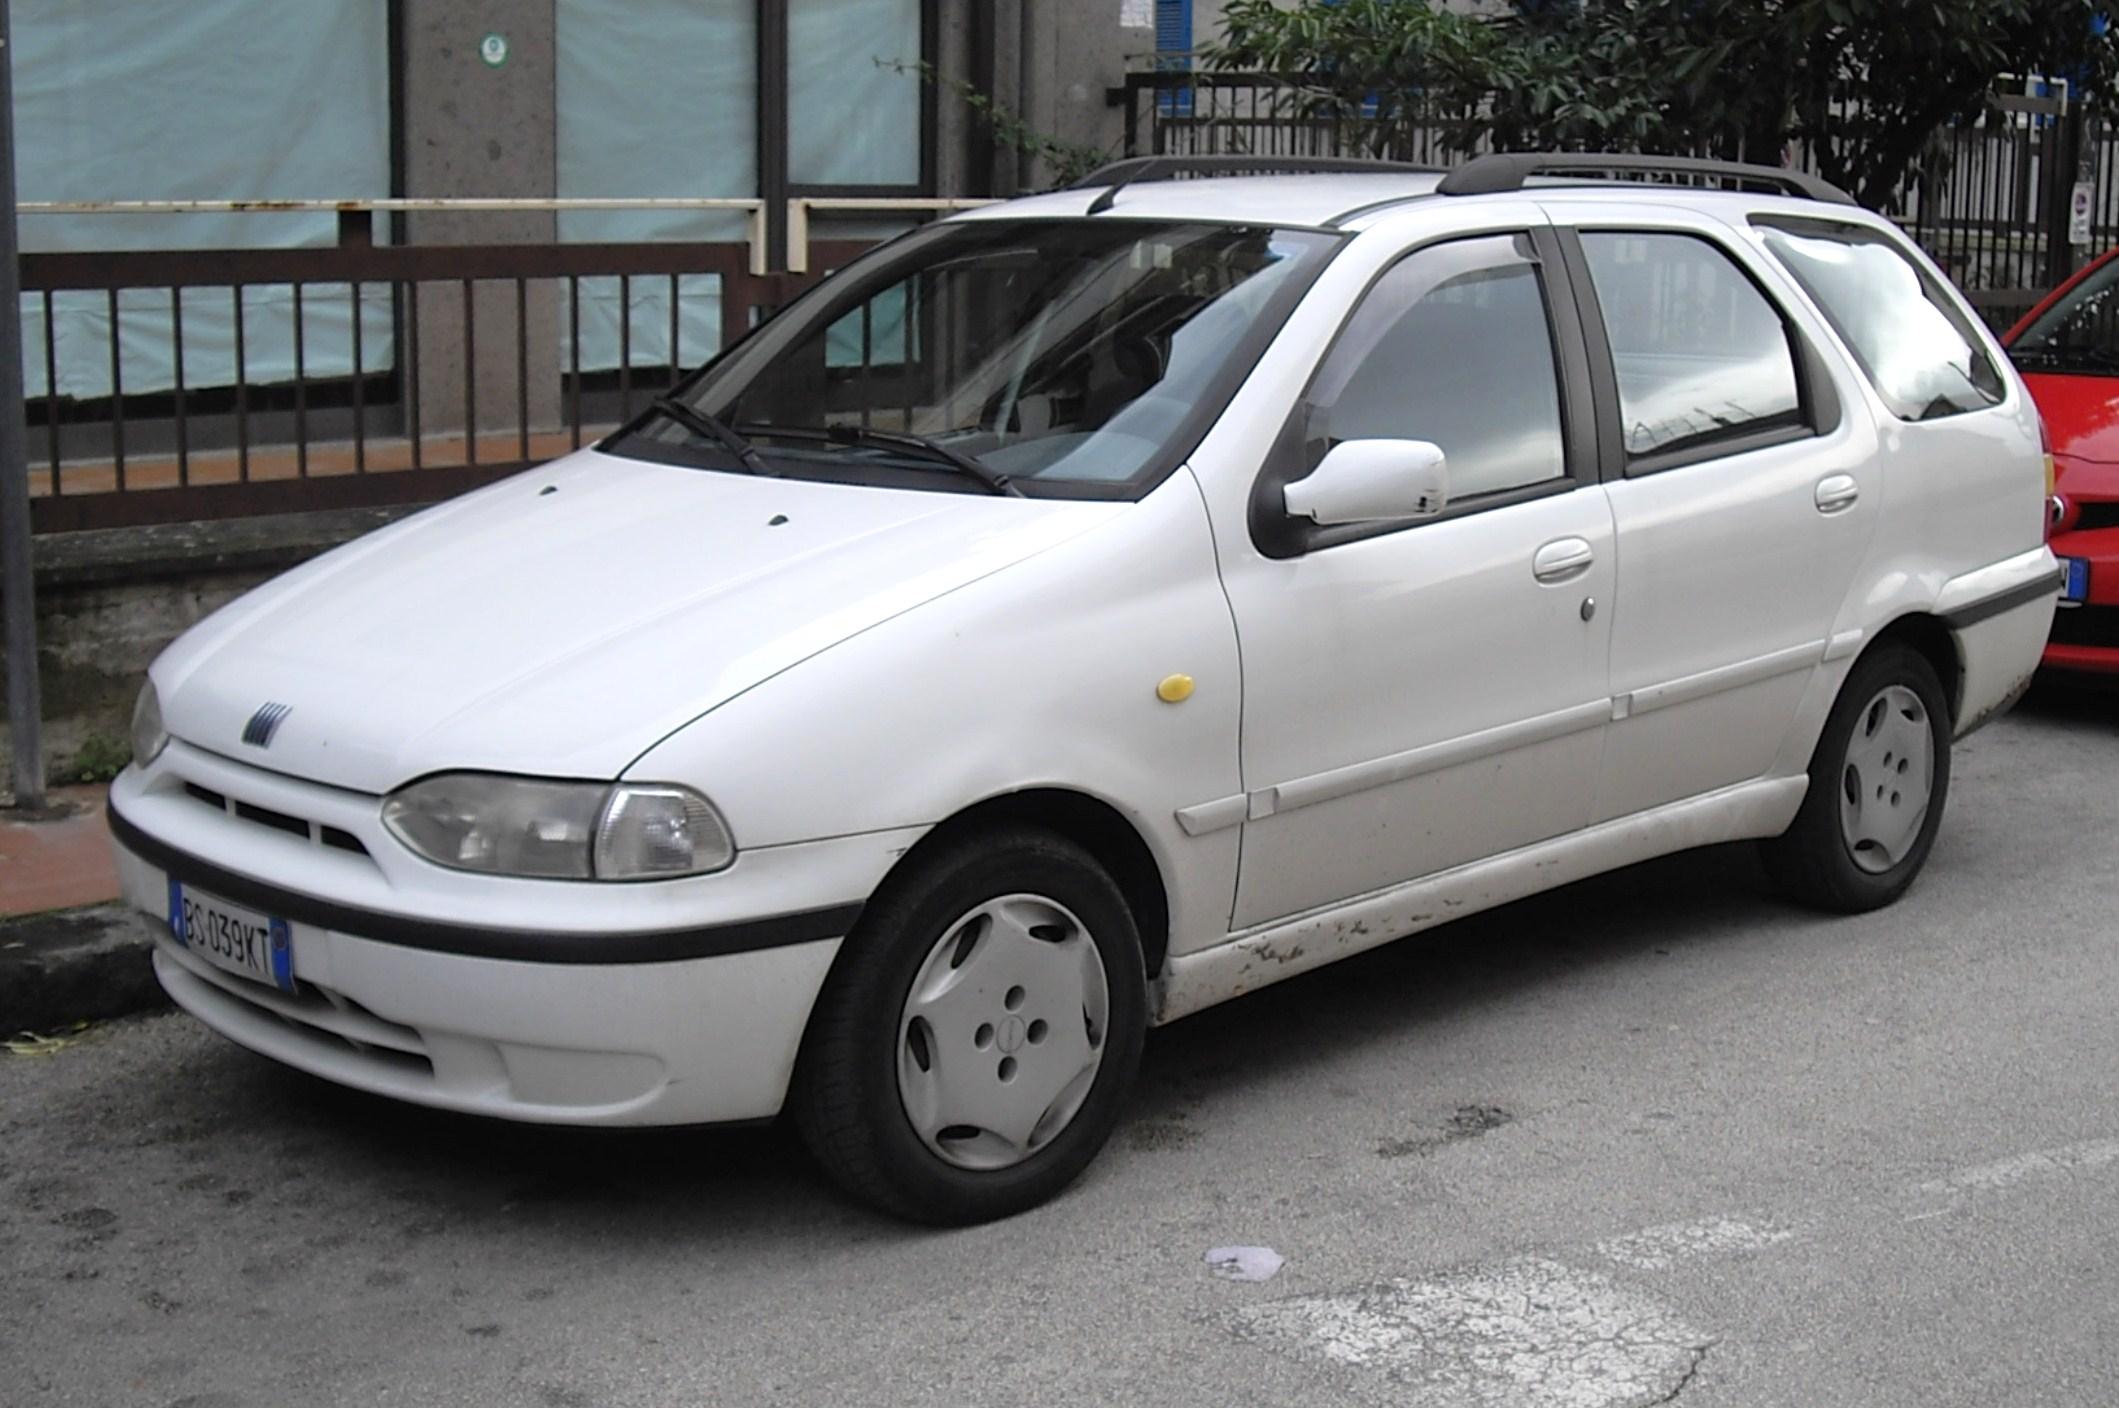 854 Suzuki Vitara 1995 Wallpaper 7 furthermore Riferimenti auto additionally File Suzuki Ignis Mk1 further Rs6 moreover Panda. on fiat panda 2000